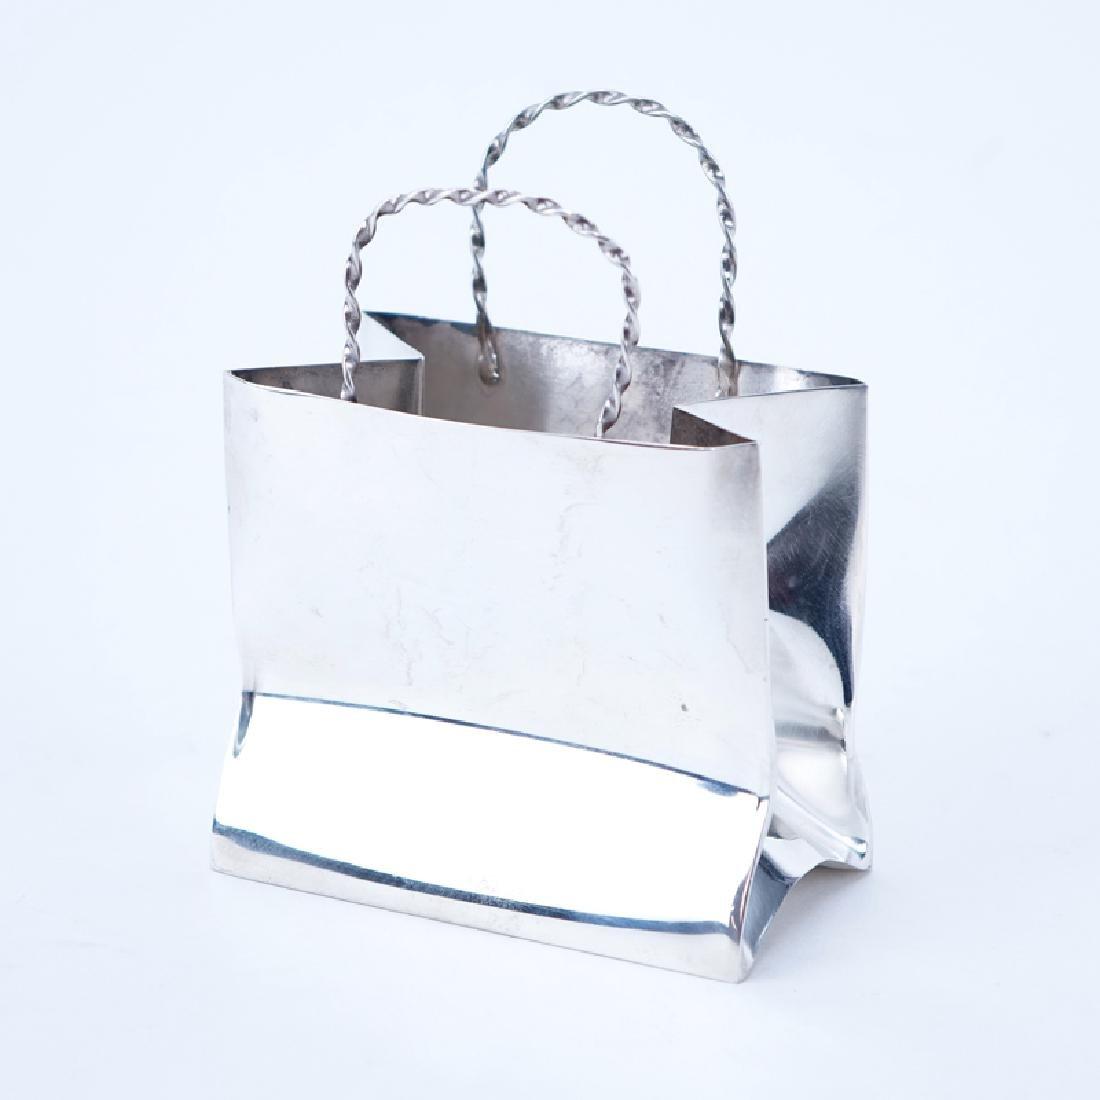 Cartier Hand Made Sterling Silver Trinket Bag. Signed.